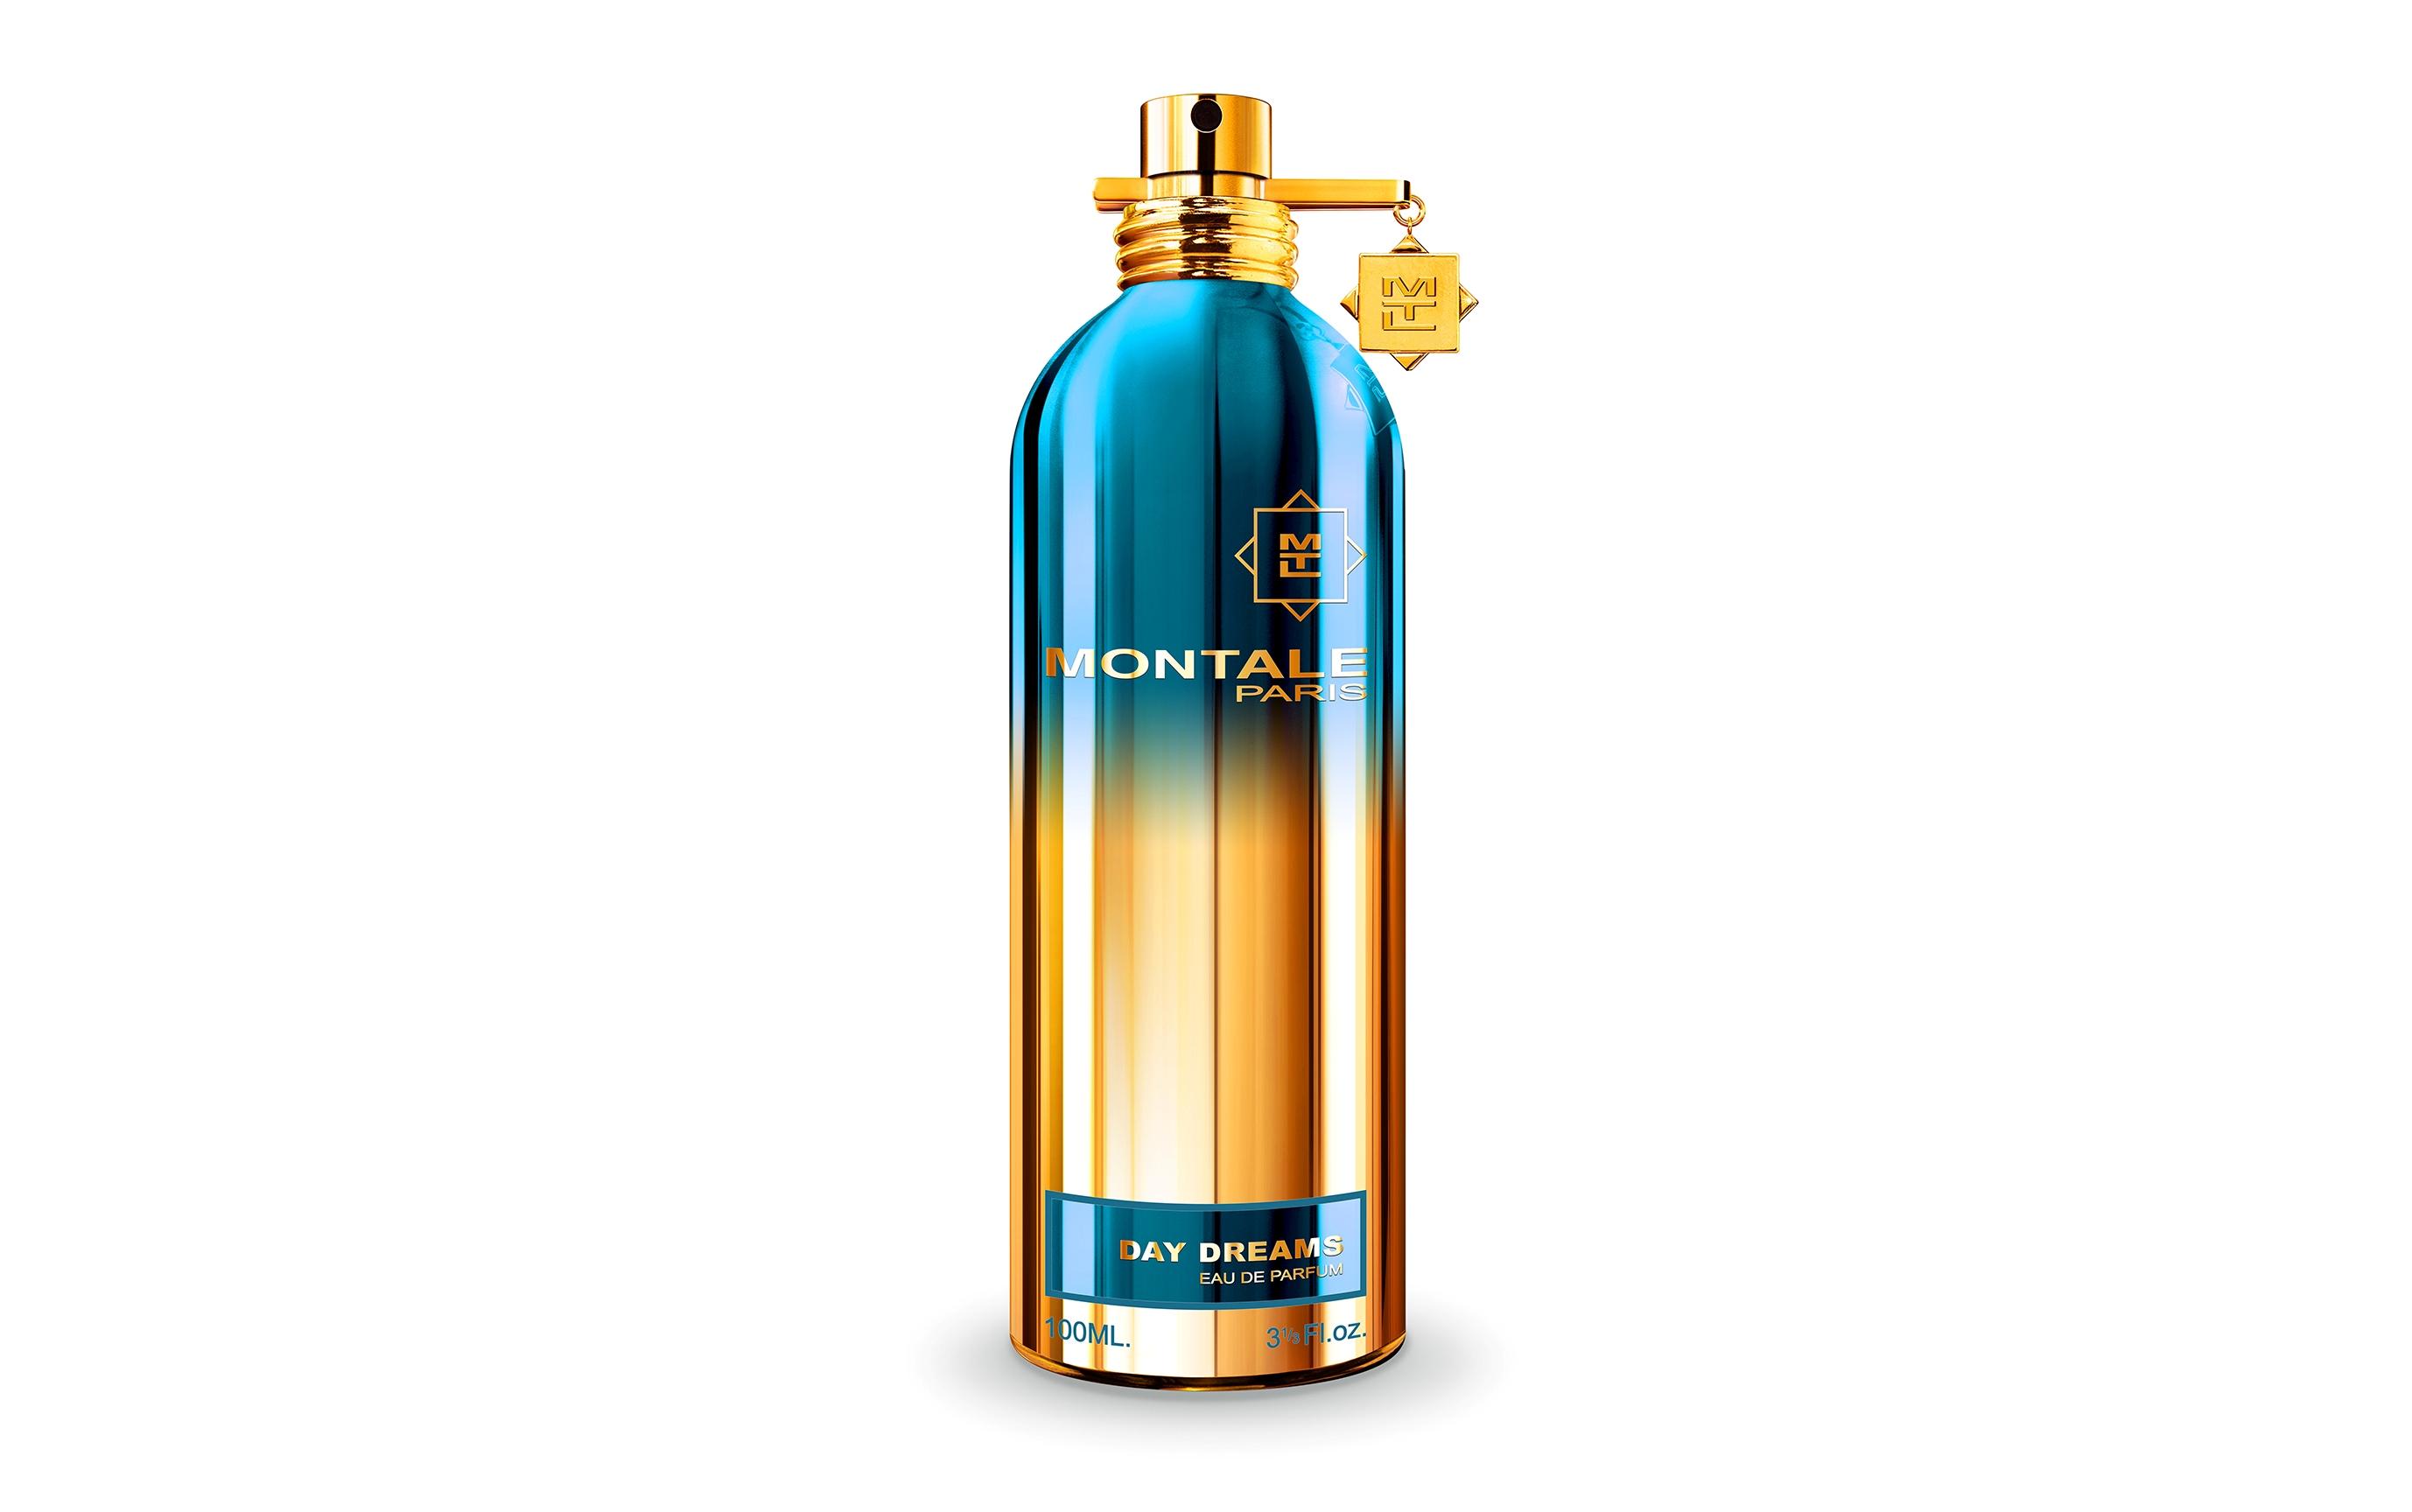 Встречайте новый аромат Montale Day Dreams